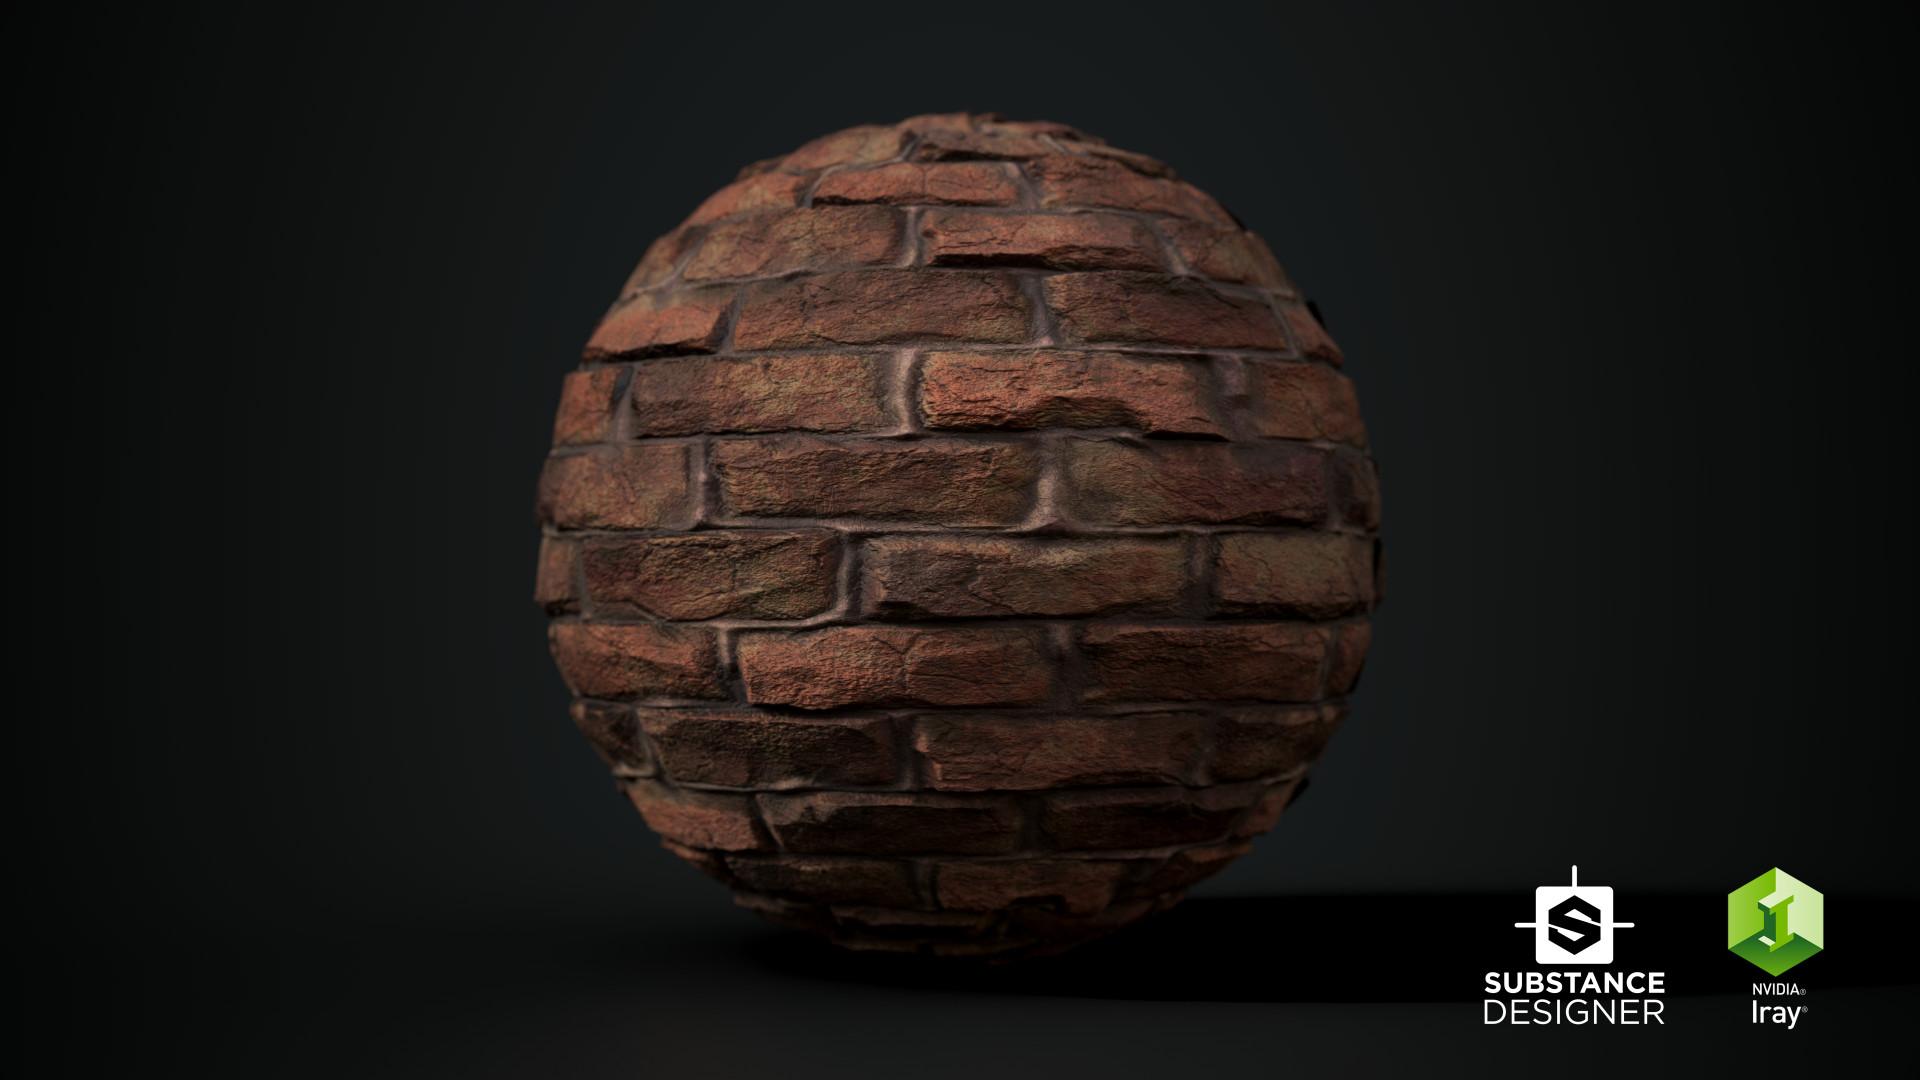 Gokhan galex ilhan brick sphere 01